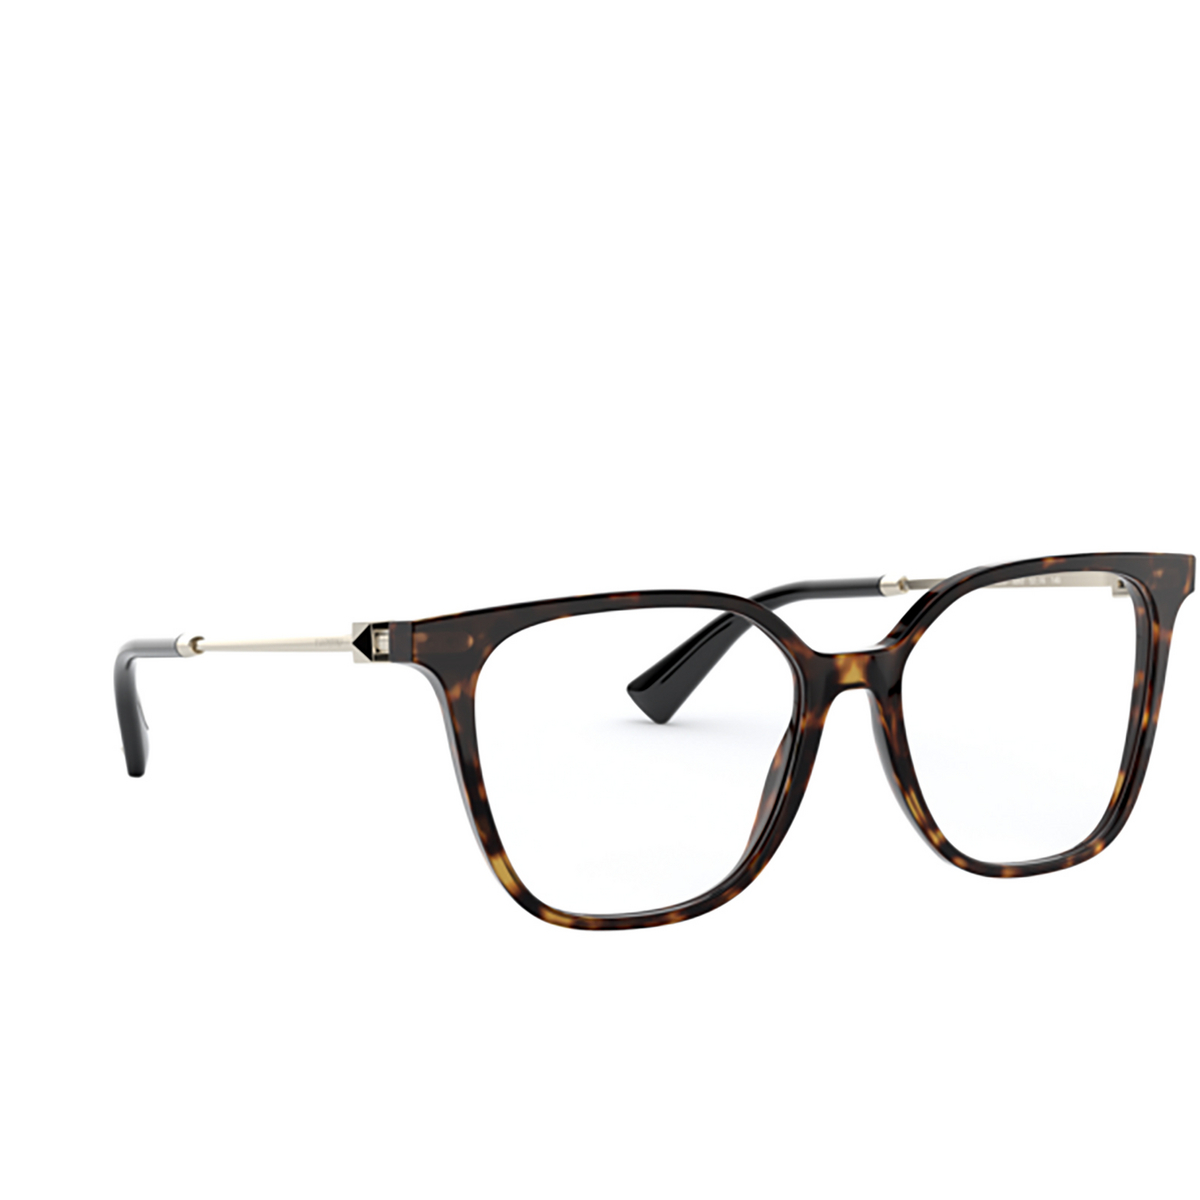 Valentino® Square Eyeglasses: VA3055 color Havana 5002 - three-quarters view.